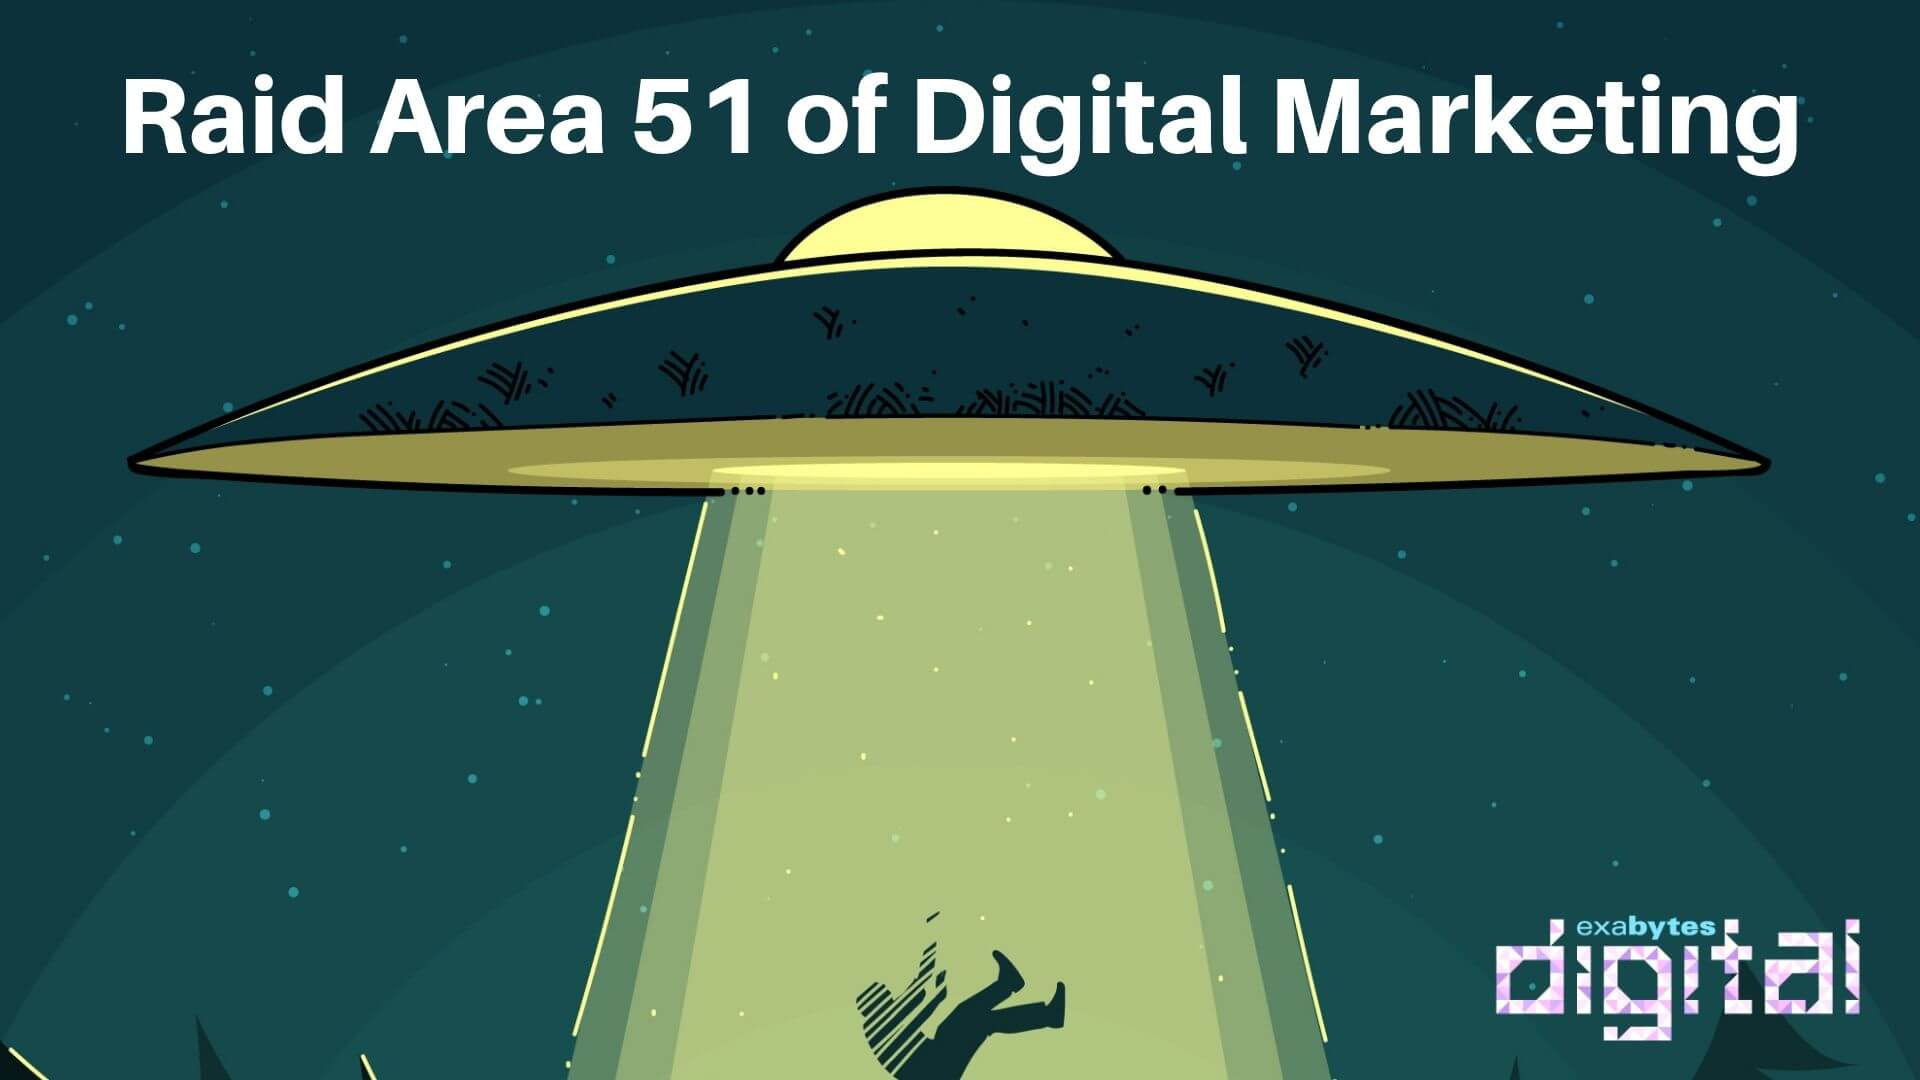 Raid Area 51 of Digital Marketing - Exabytes Digital